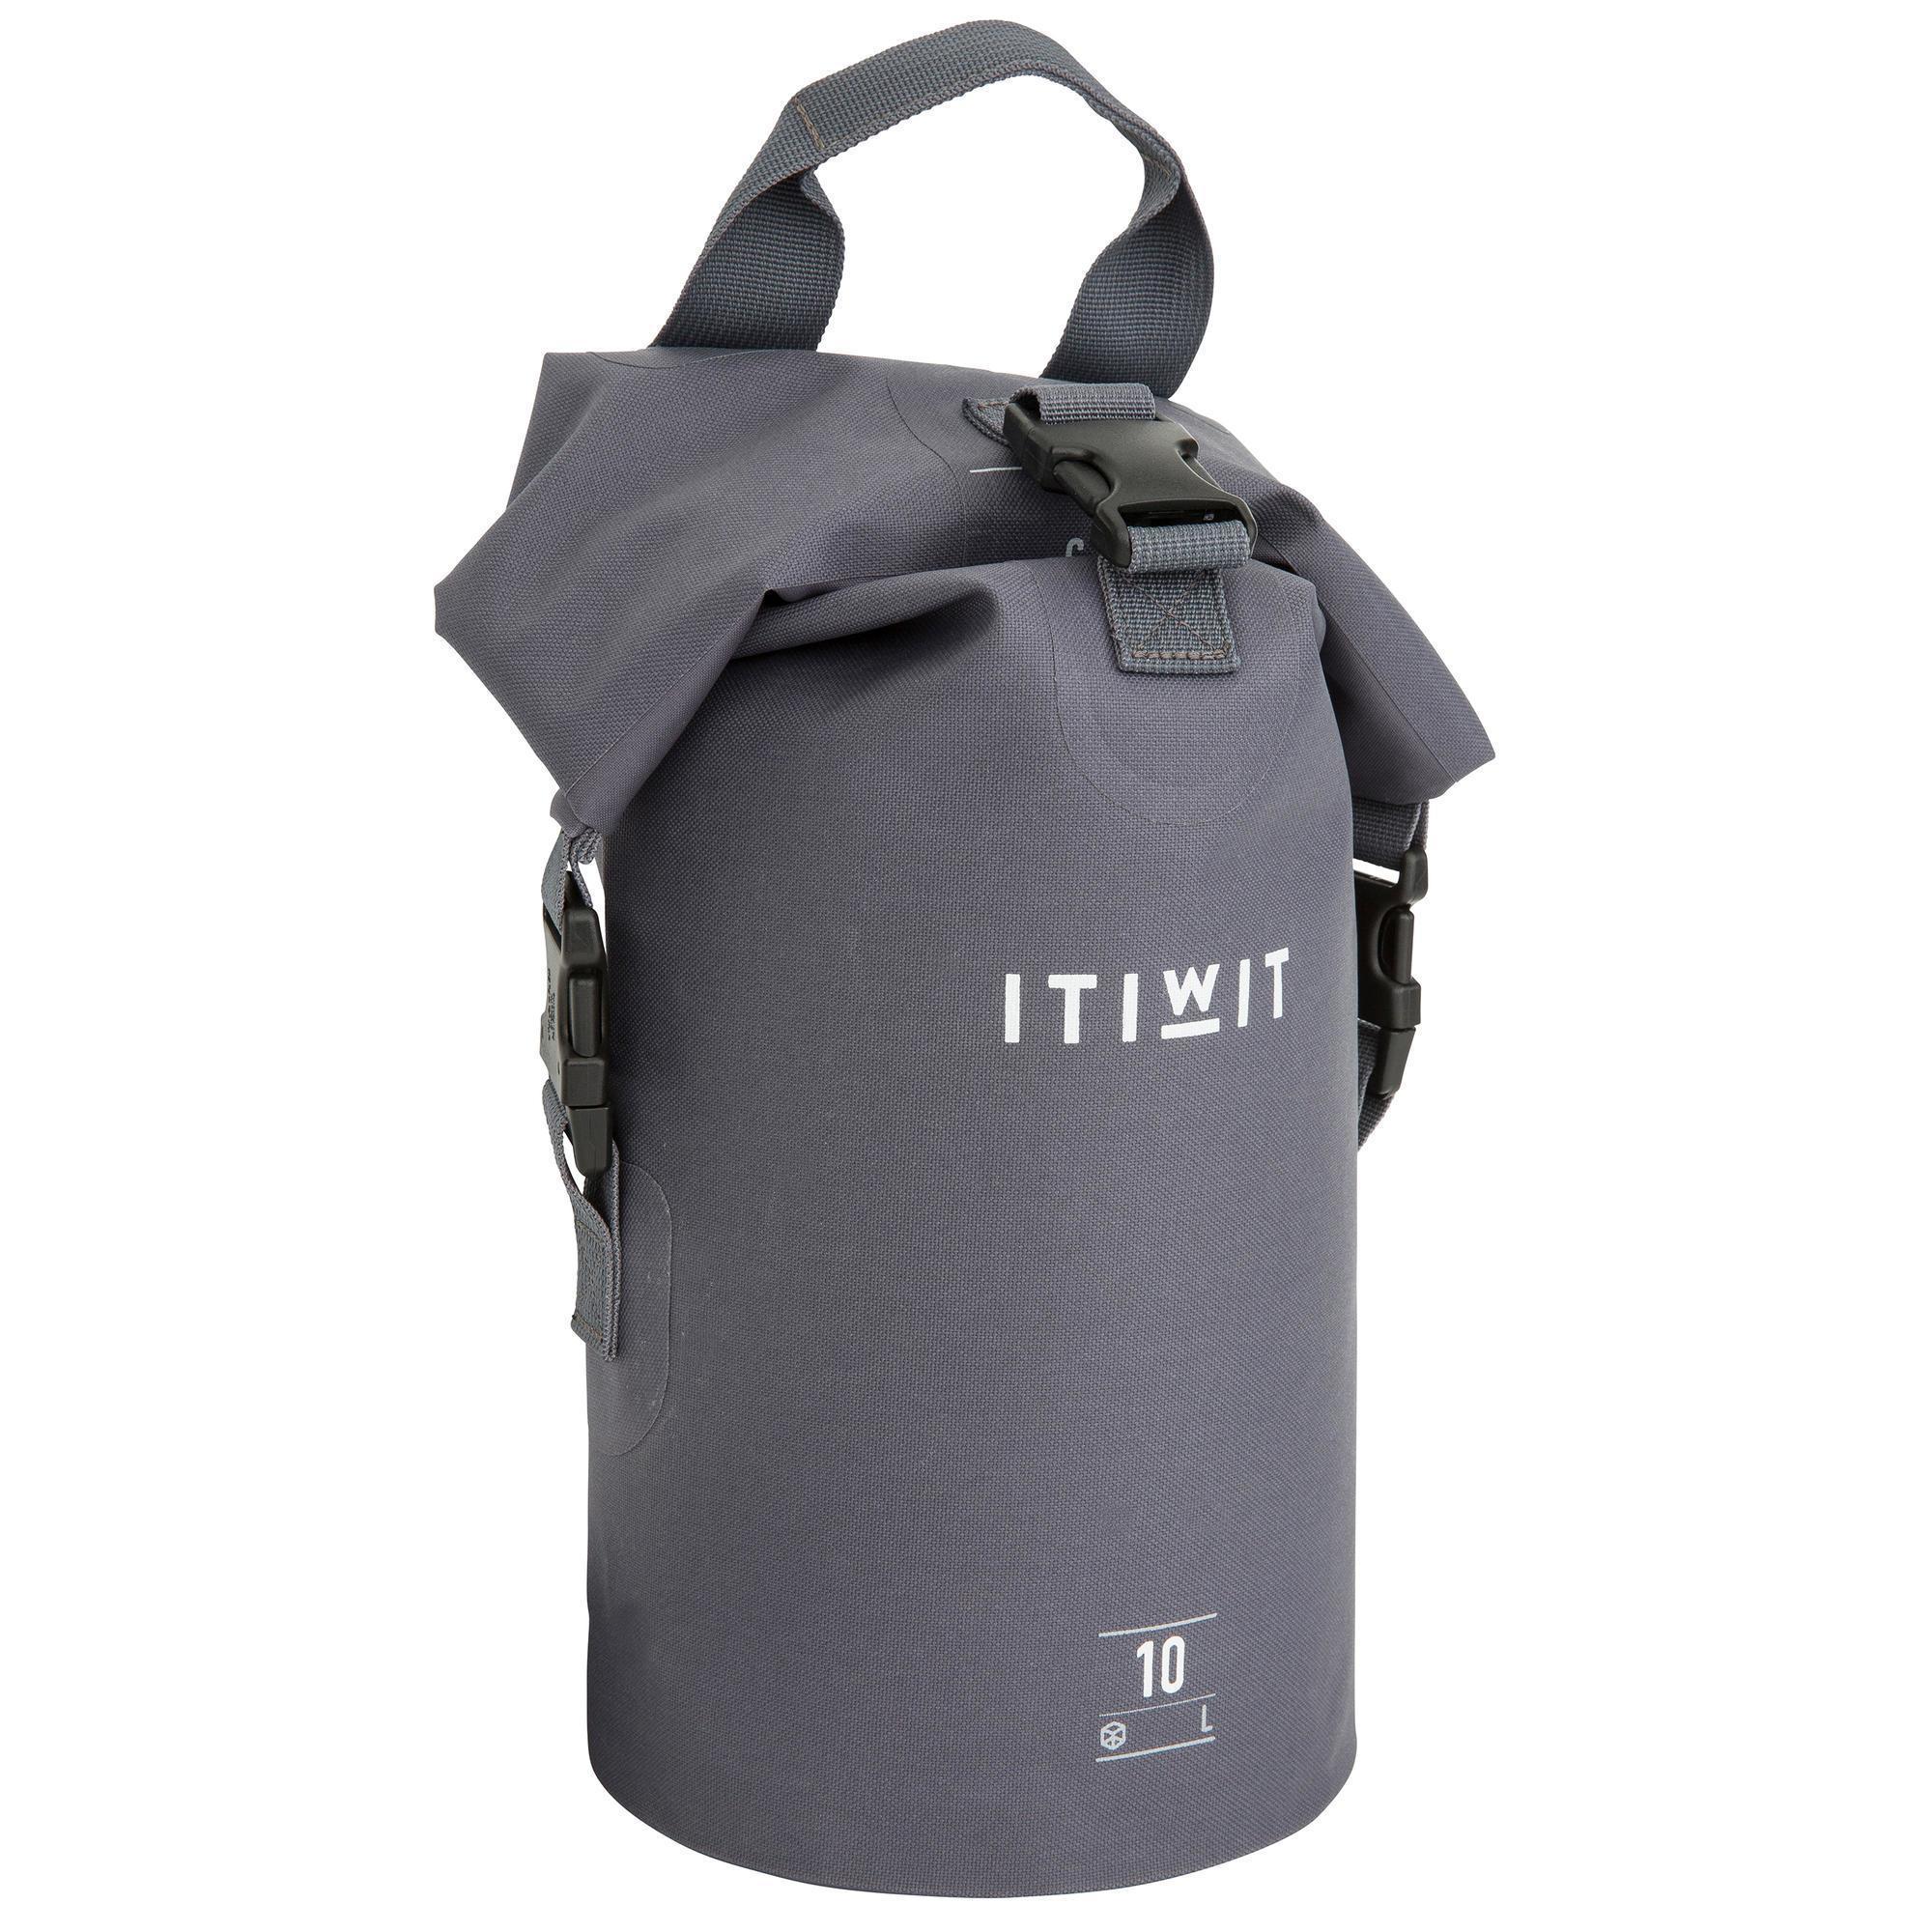 3ad27966f92 Itiwit Waterdichte rugzak duffle bag 10 l - Itiwit - Decathlon.nl ...